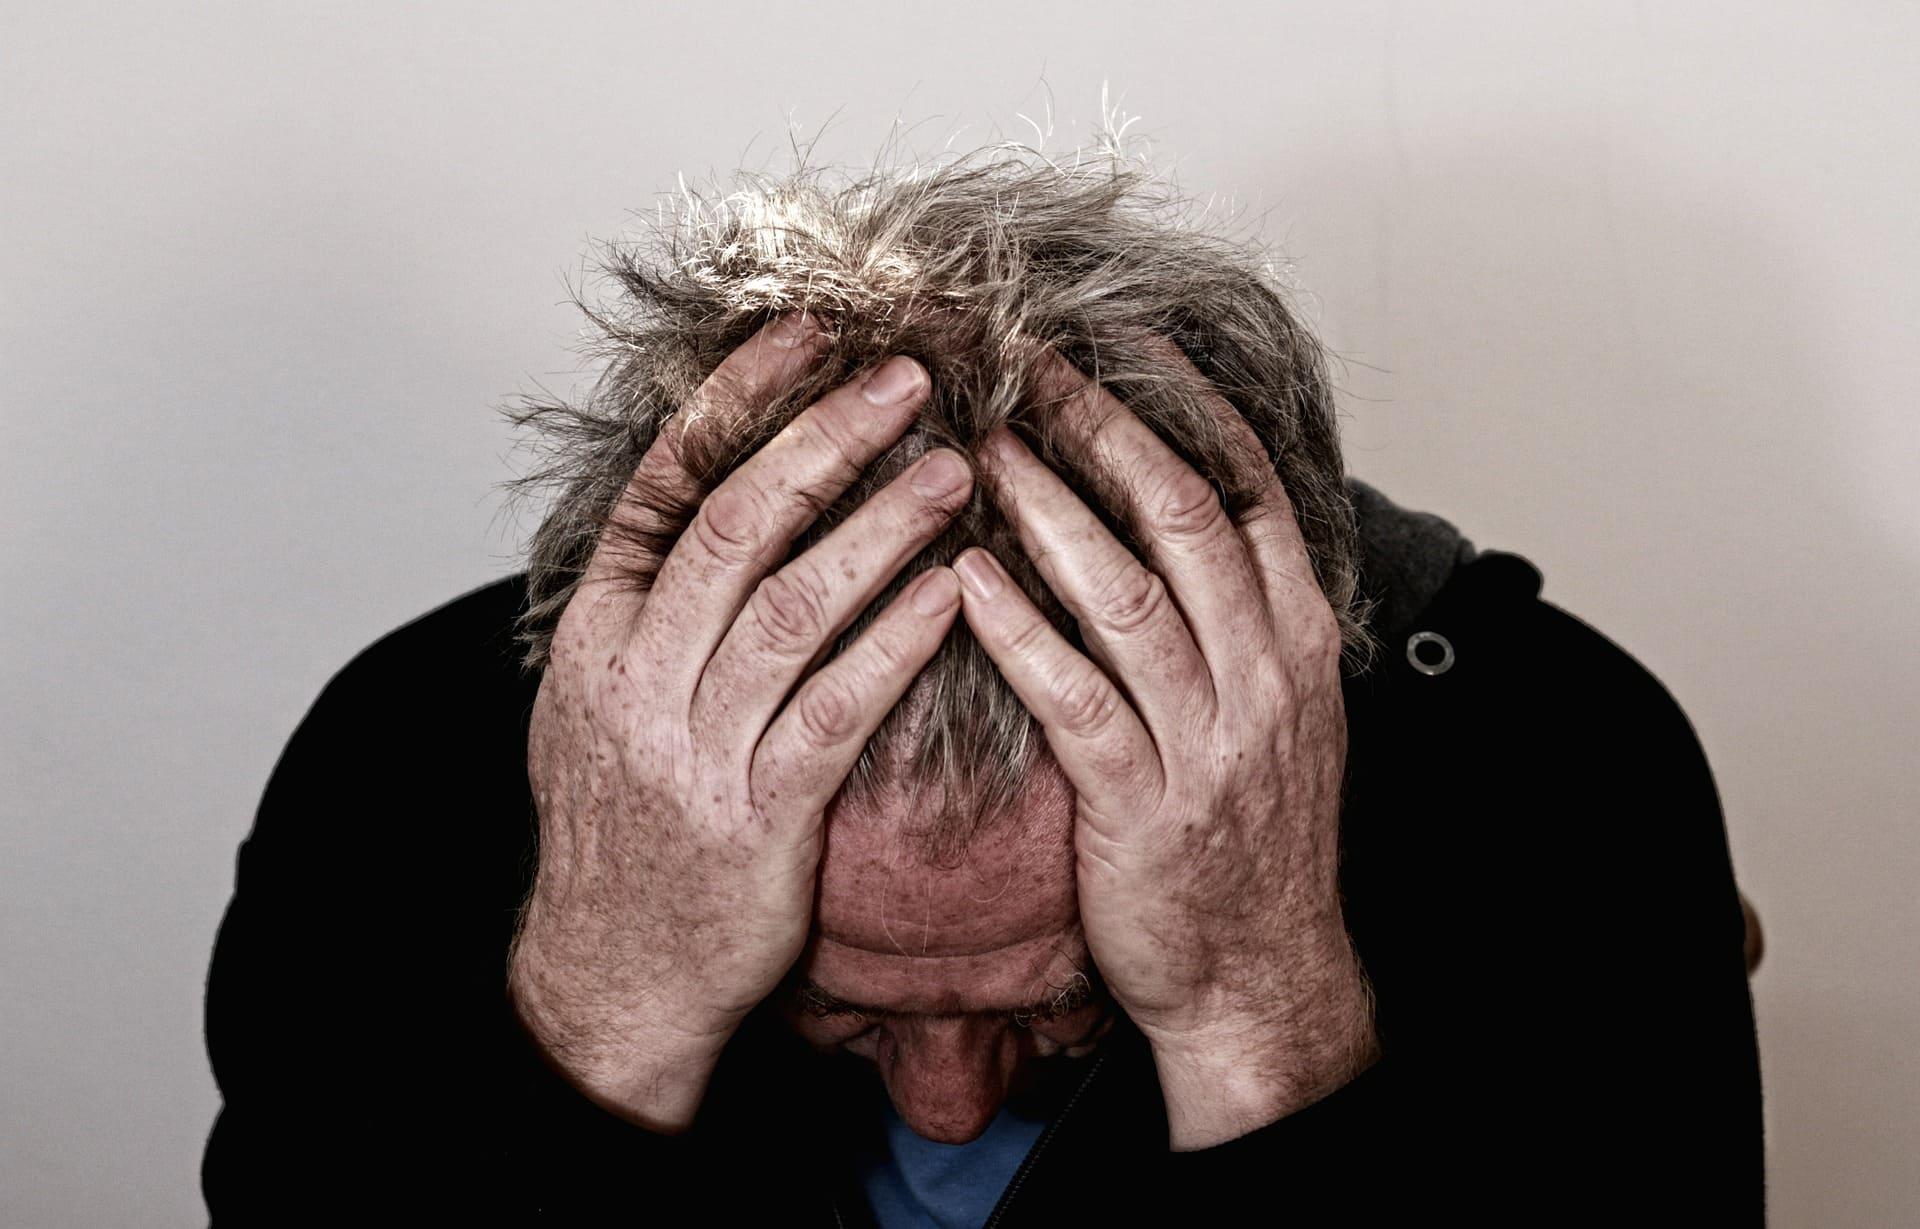 sintomi sclerosi multipla ability channel depressione